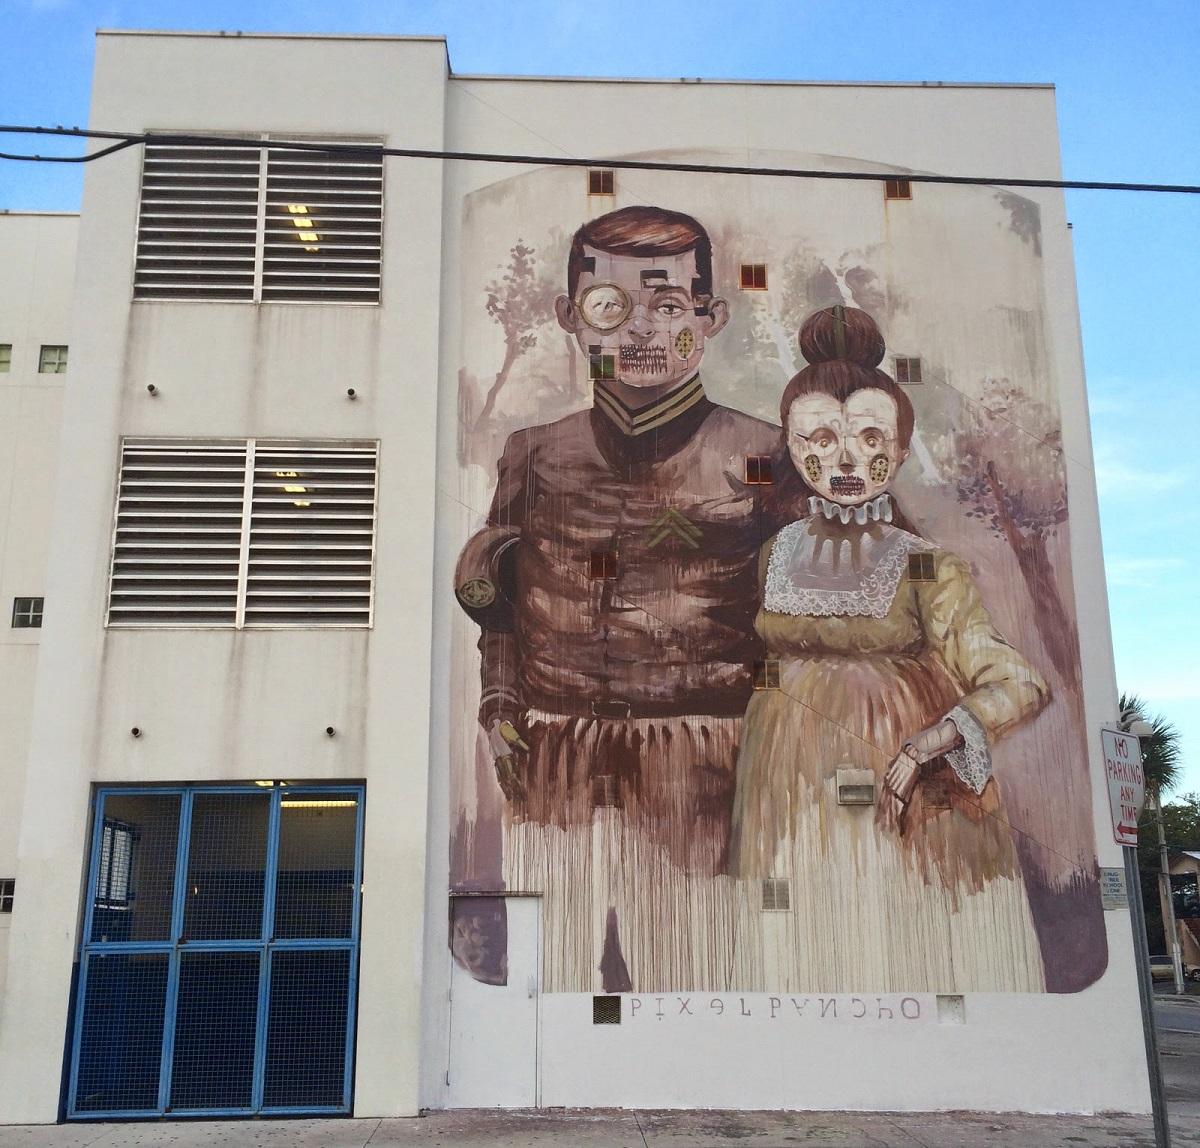 pixel-pancho-new-mural-for-art-basel-2014-01